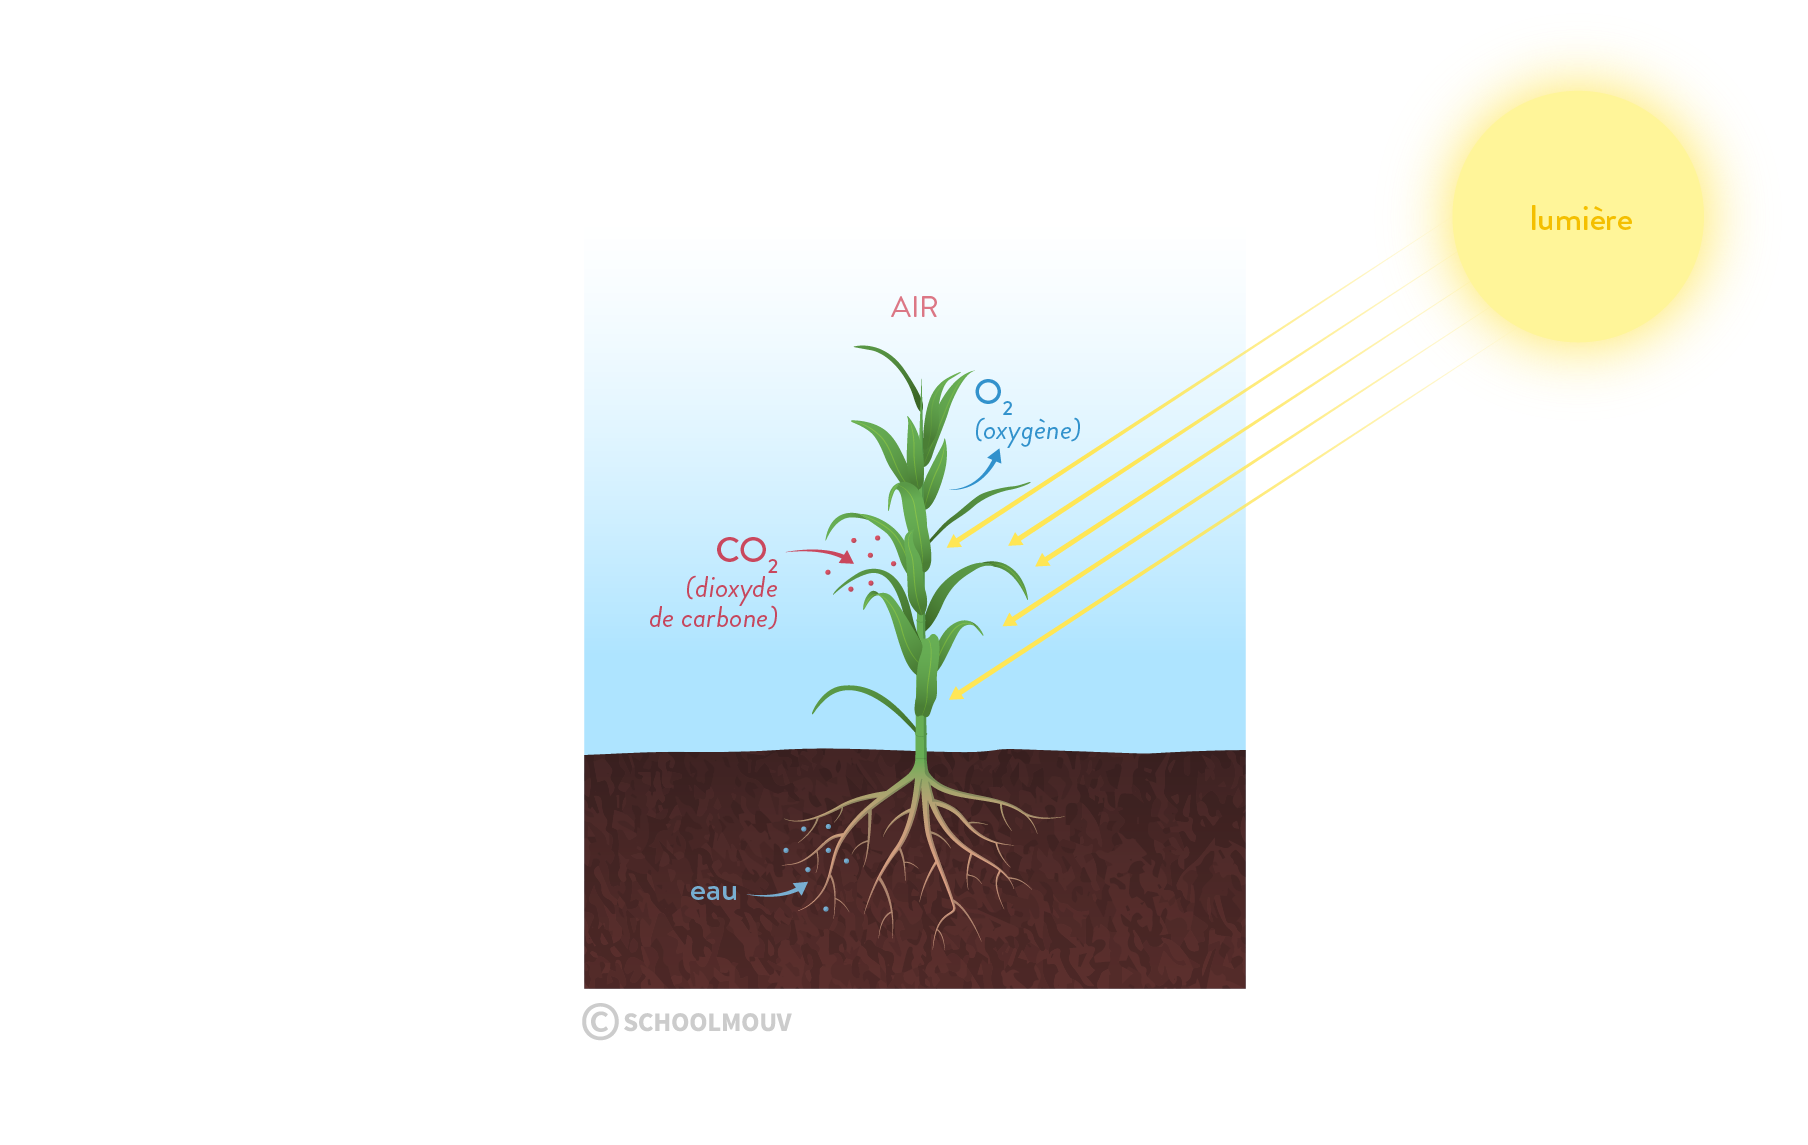 photosynthèse matière organique stockage carbone